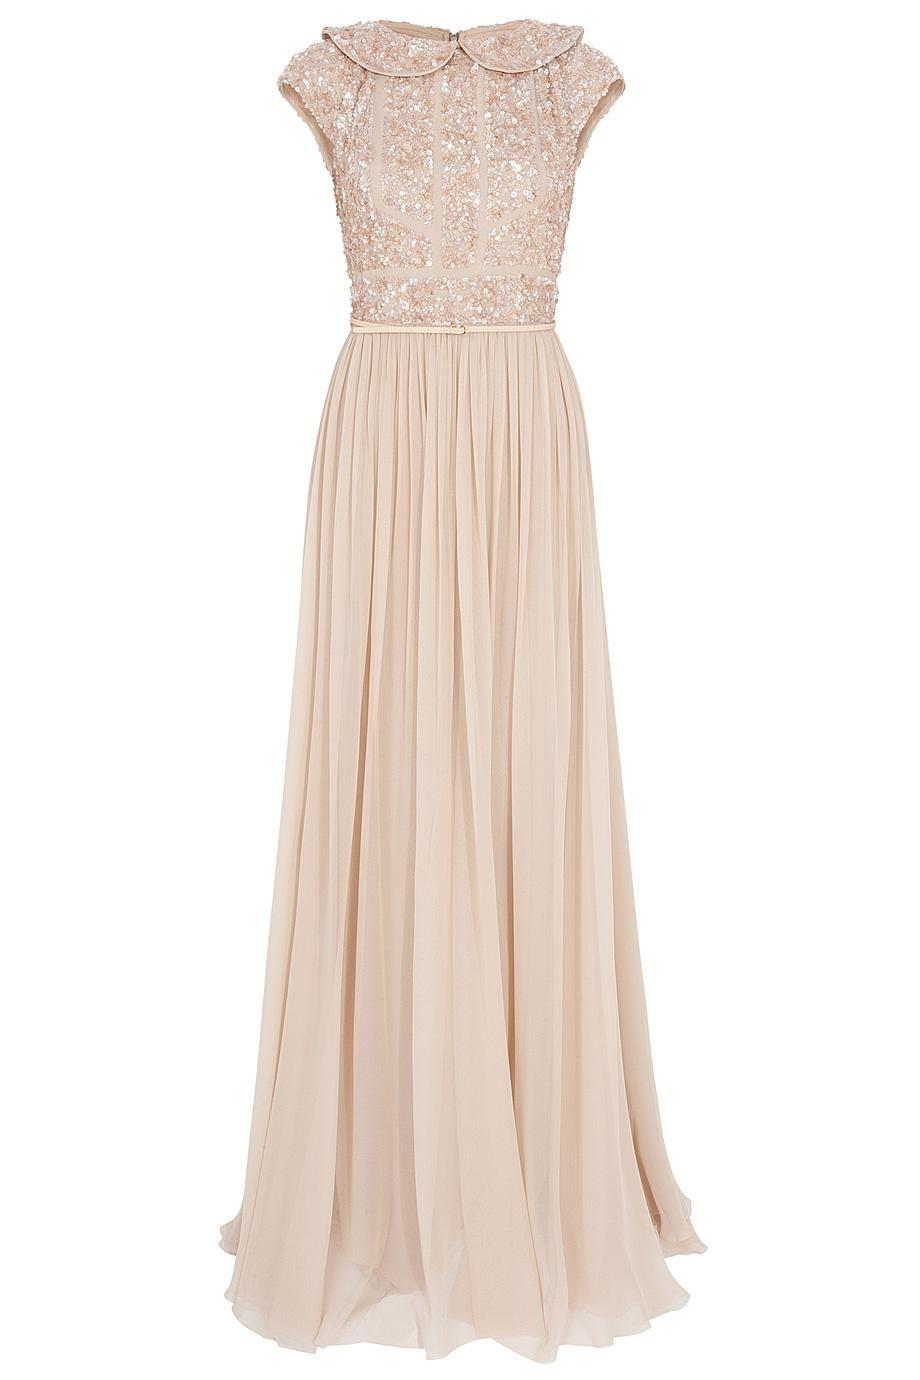 Gorgeous elie saab cap sleeve beaded top silk gown dresses